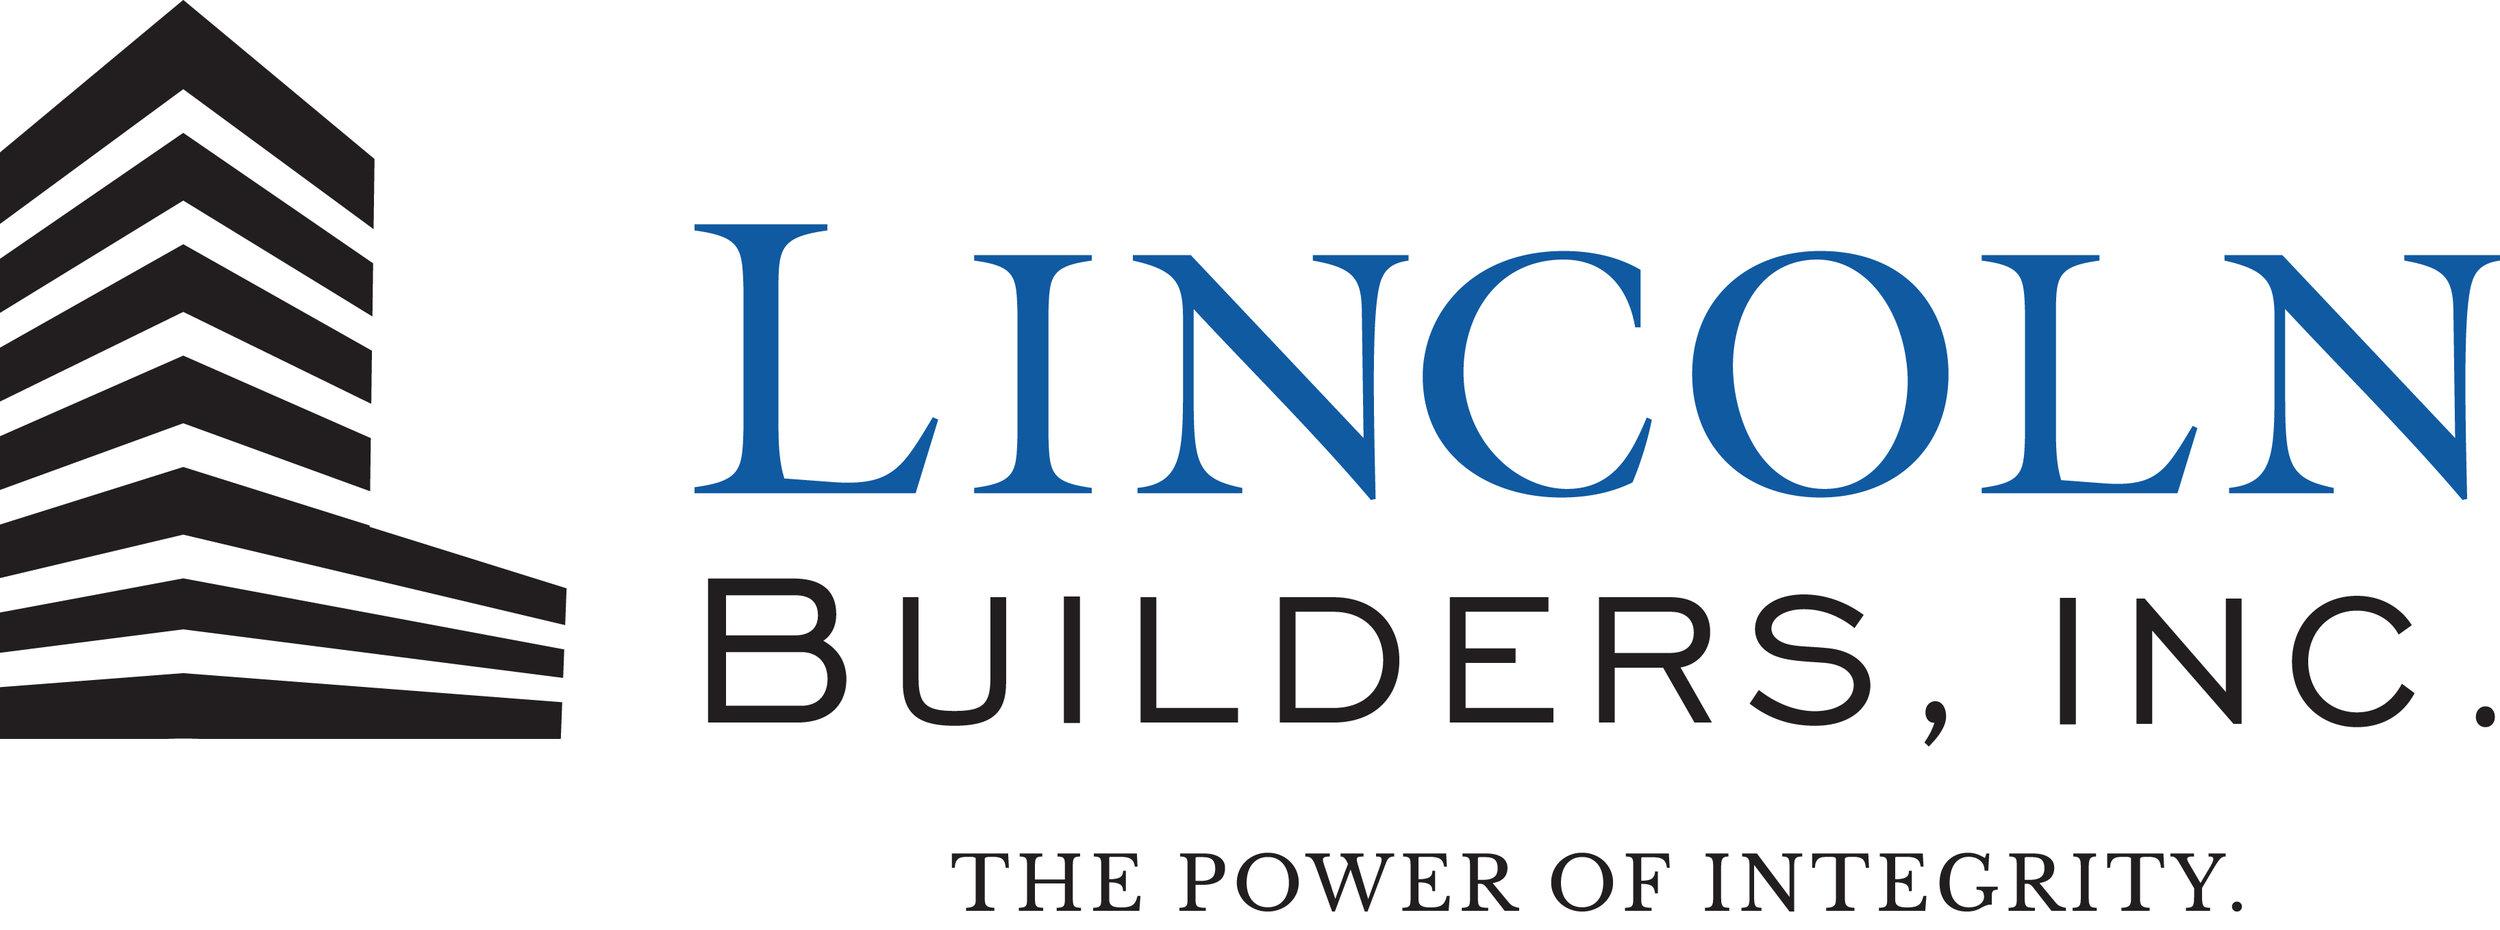 lincolnBuilders_logo_color.jpg